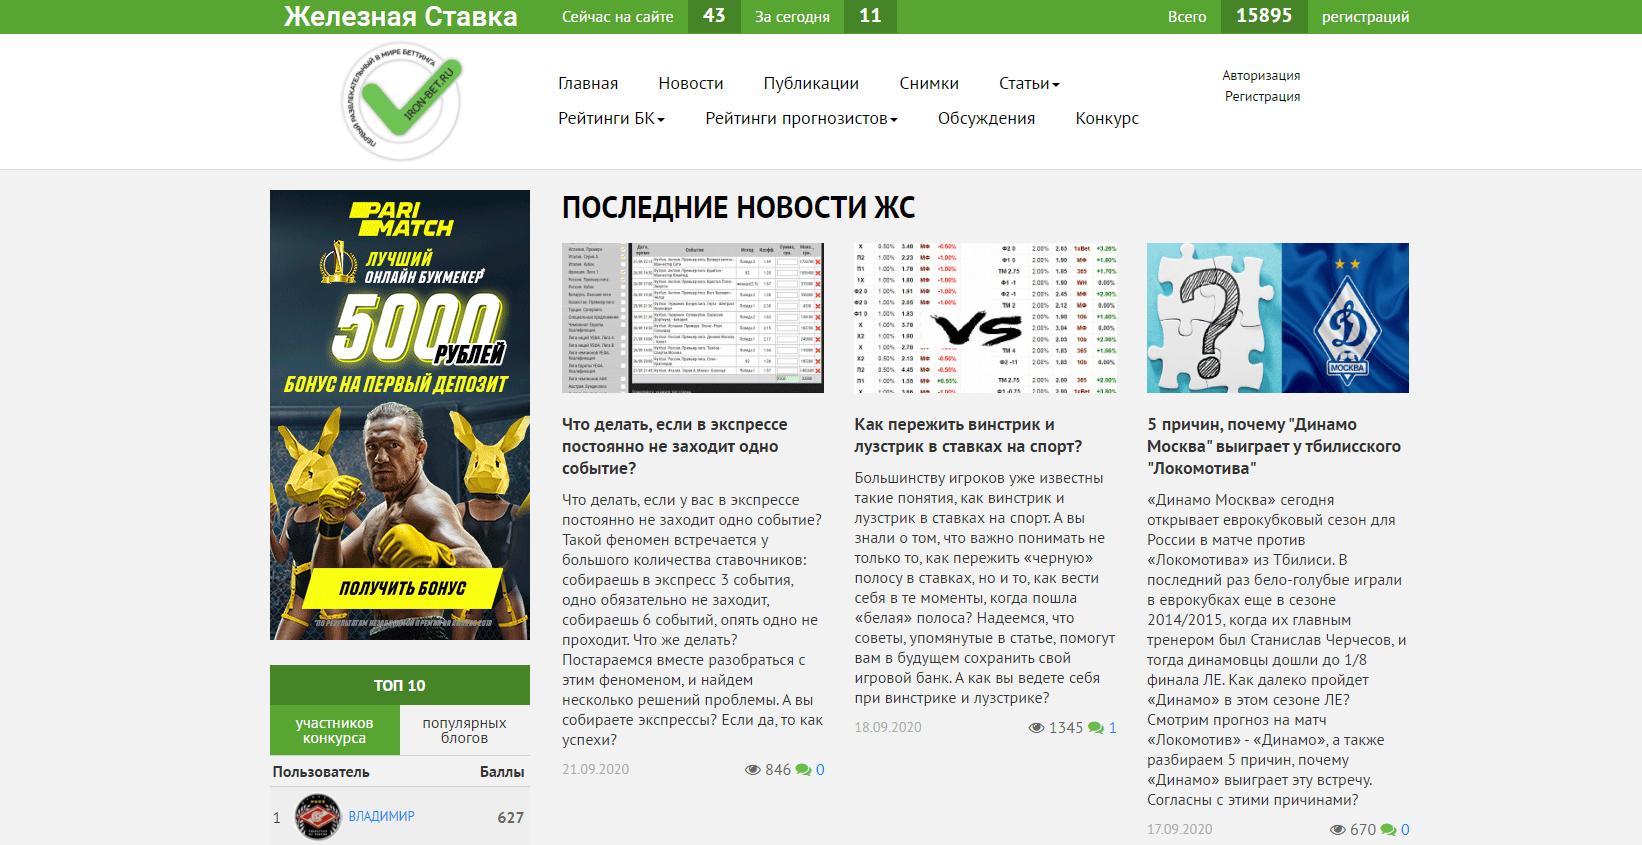 Главная страница сайта Андрея Алистарова Железная ставка